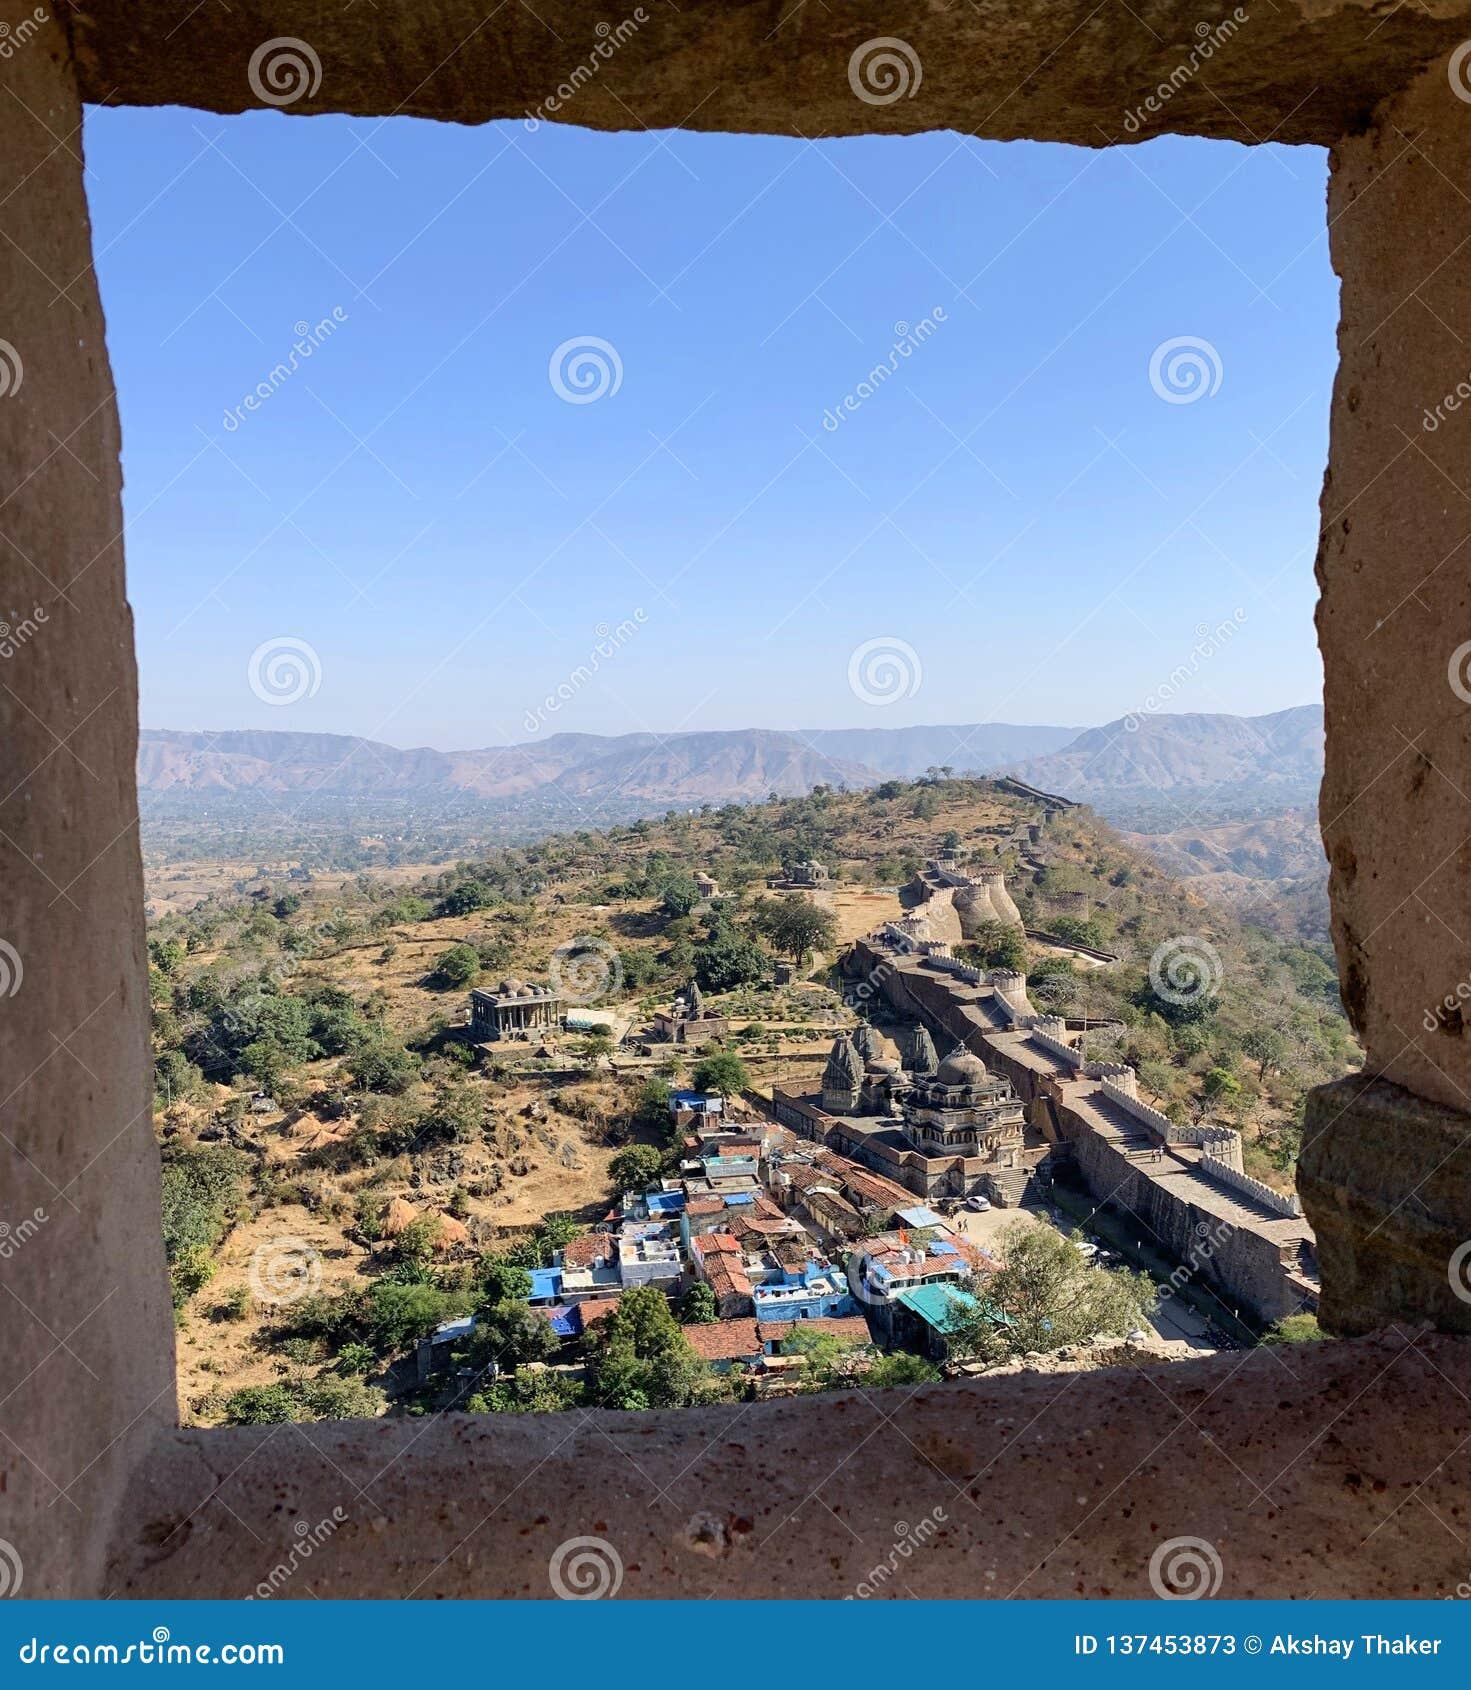 Kumbhalgarhfort complex in Rajasthan India